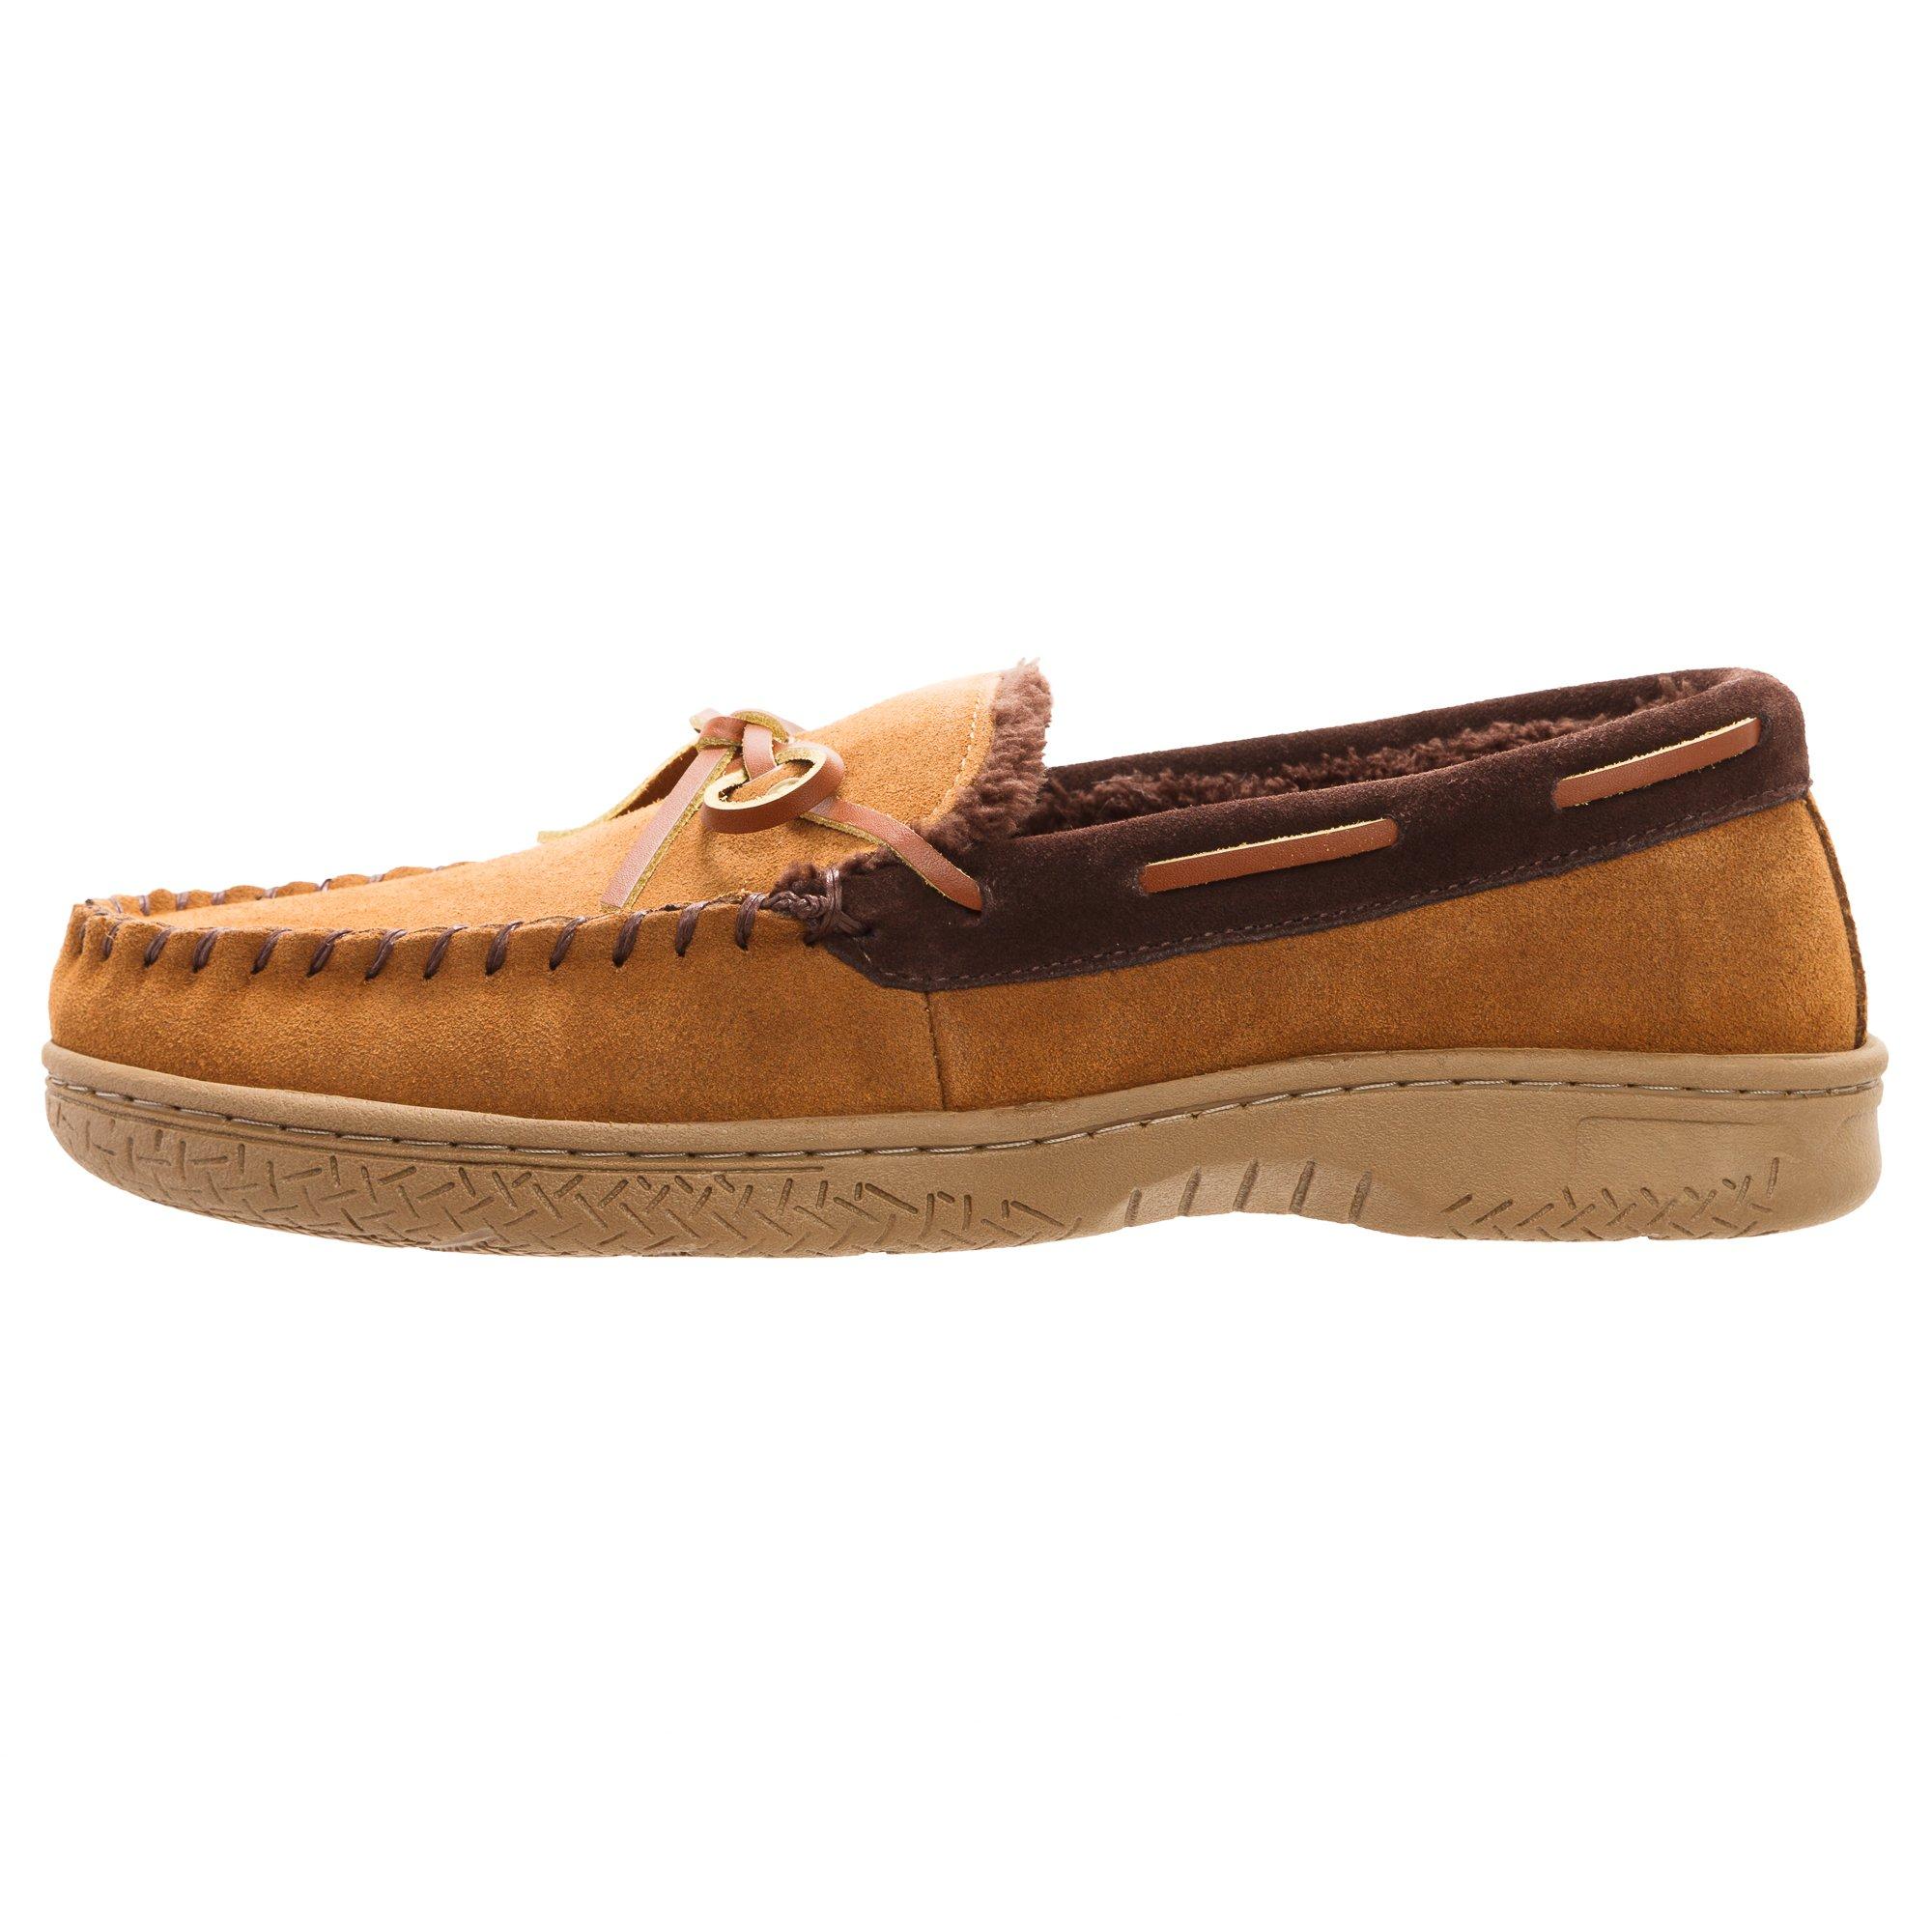 Heat Edge Mens Memory Foam Suede Slip on Indoor/Outdoor Moccasin Slipper Shoe (11, Tan) by Heat Edge (Image #4)